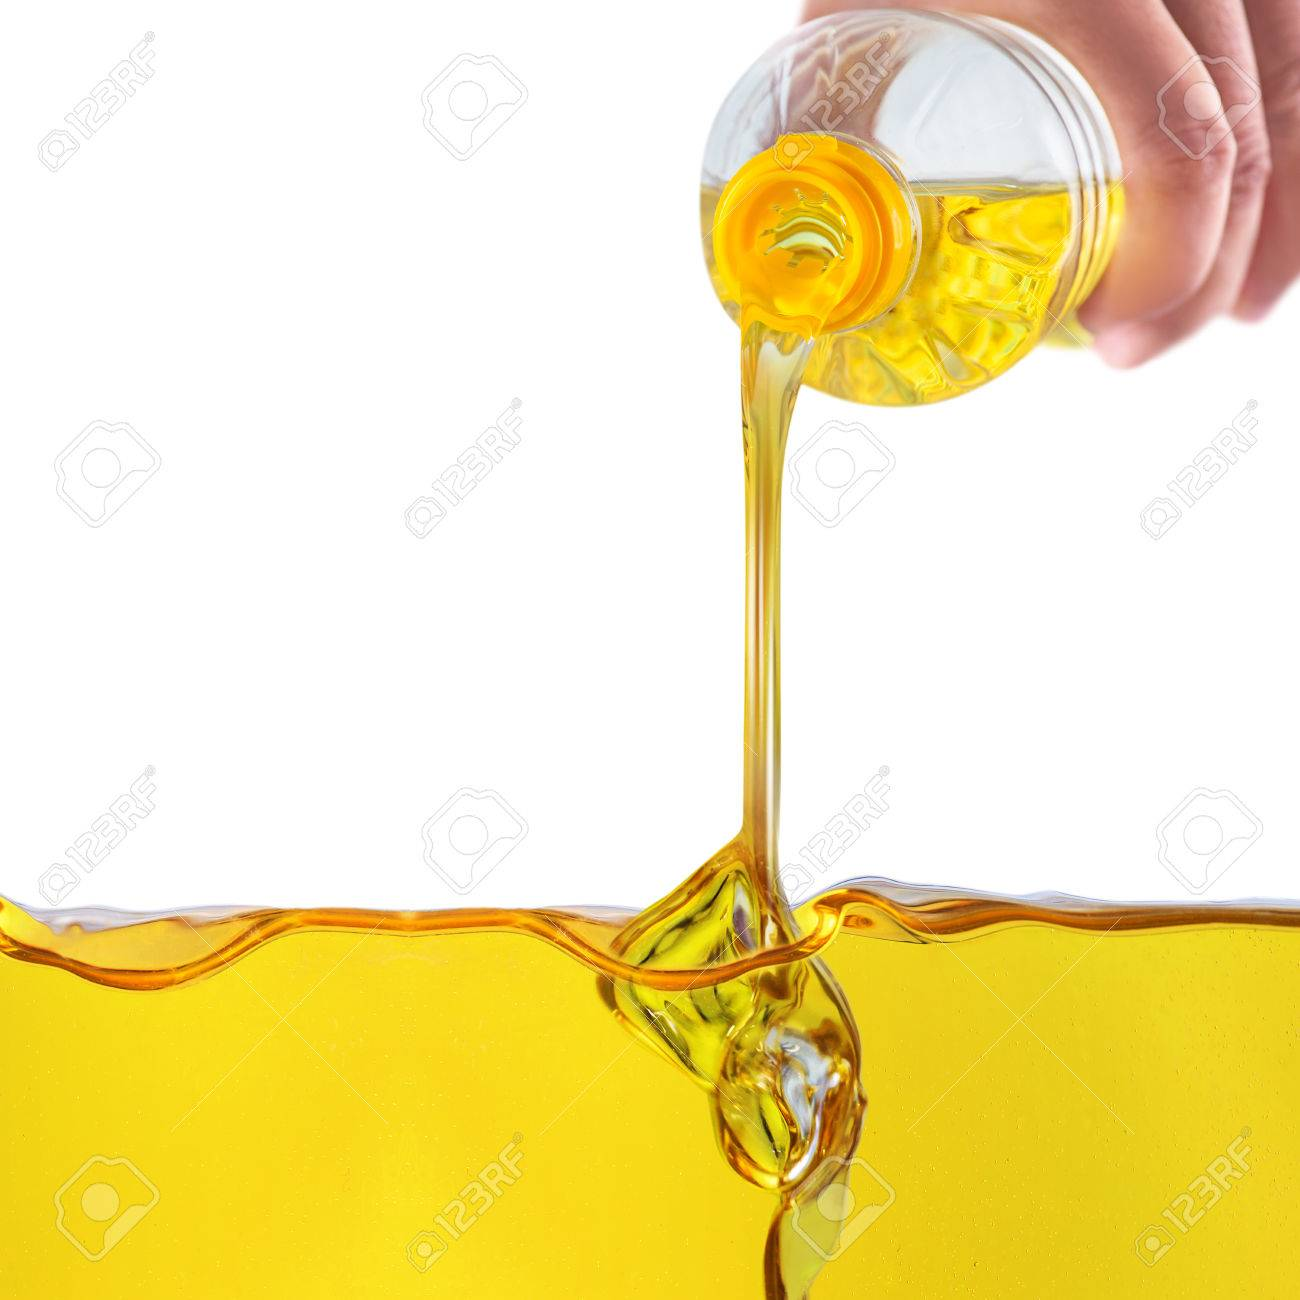 Vegetable oil pouring on vegetable oil background - 61836755